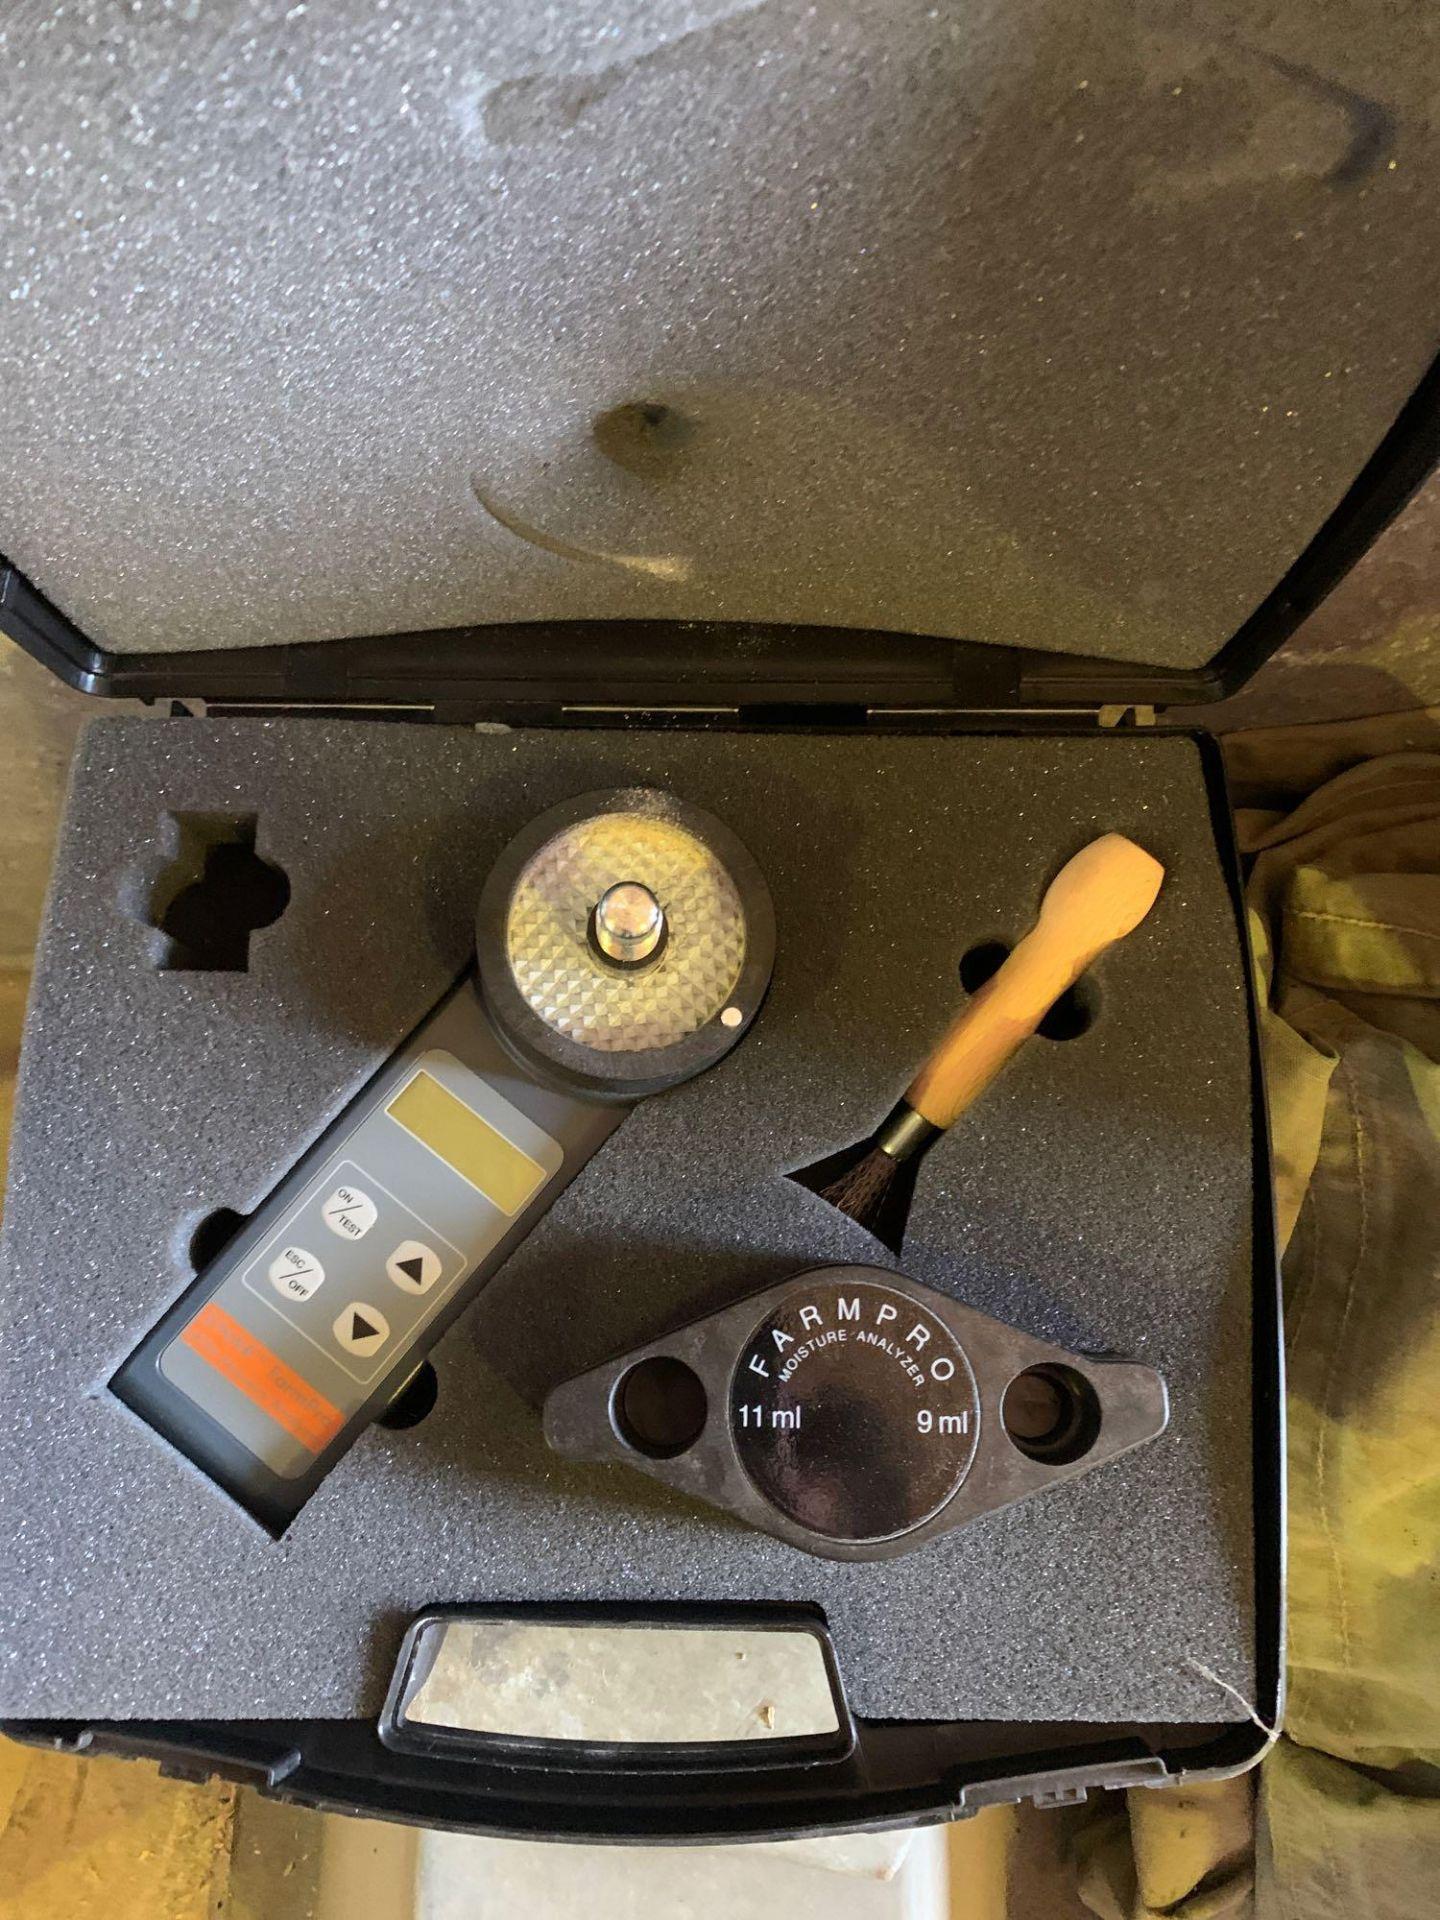 Sinar moisture meter - Image 3 of 4